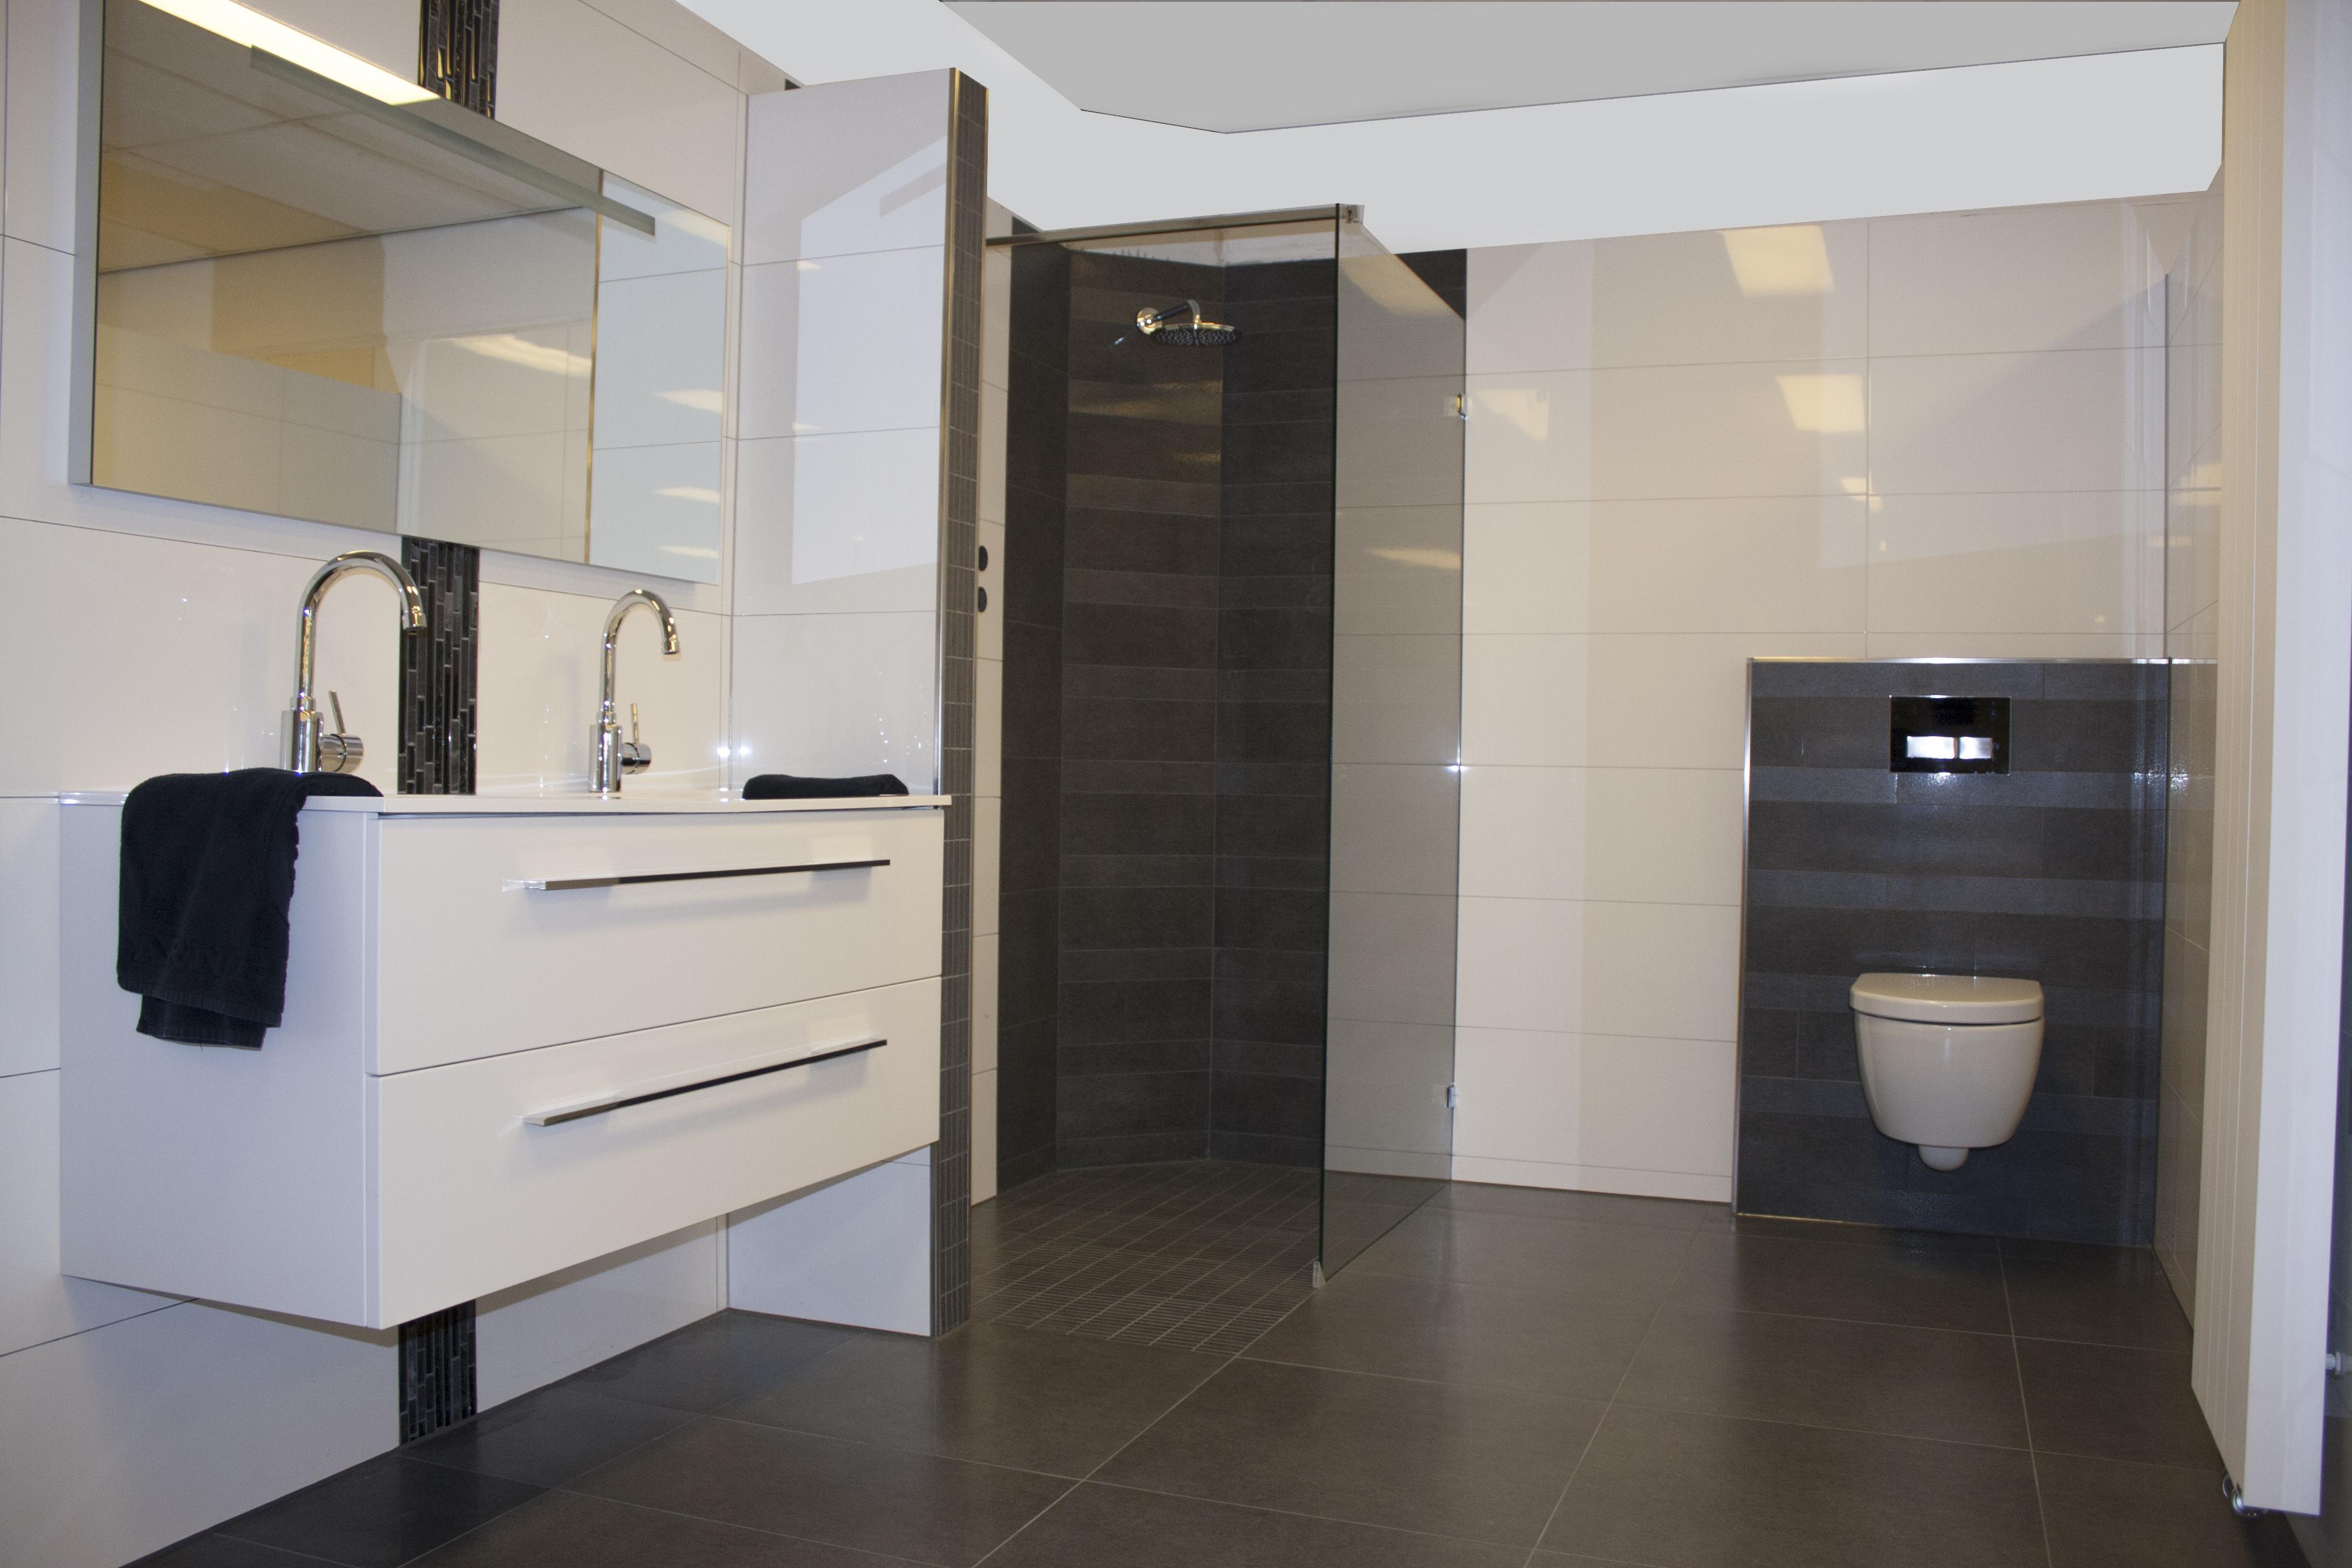 afvoer lekkage badkamer